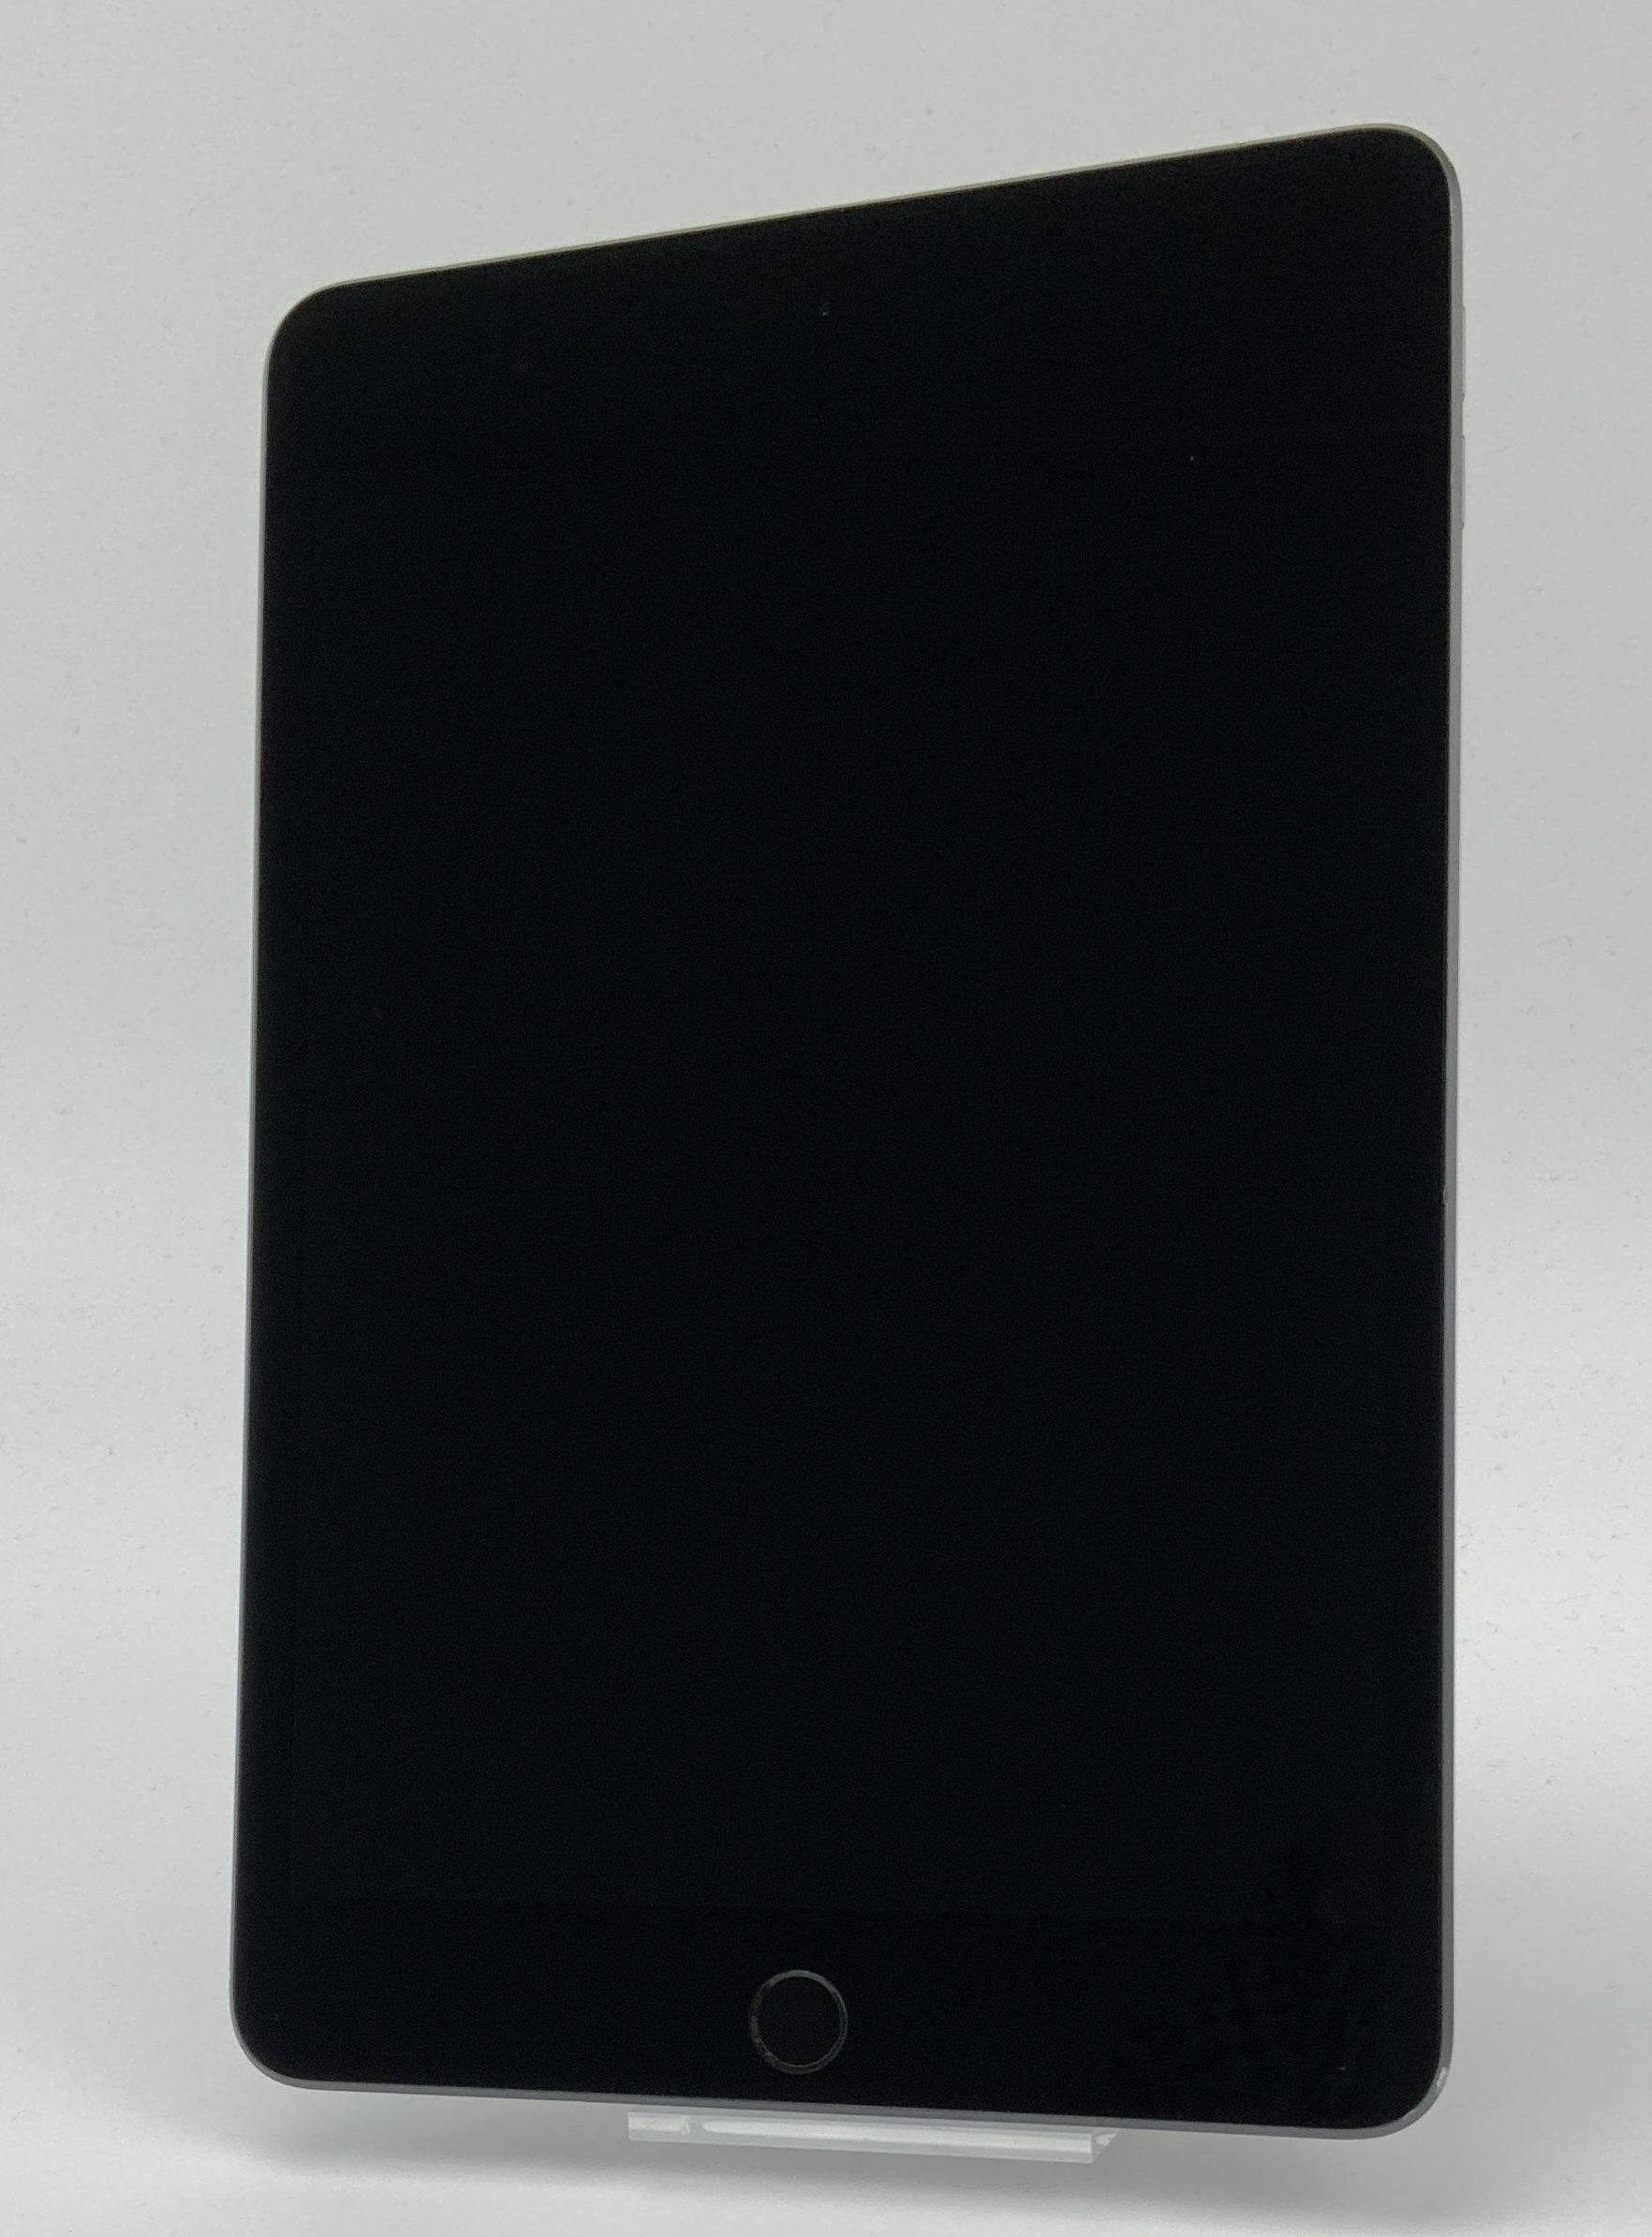 iPad mini 5 Wi-Fi + Cellular 64GB, 64GB, Space Gray, imagen 1